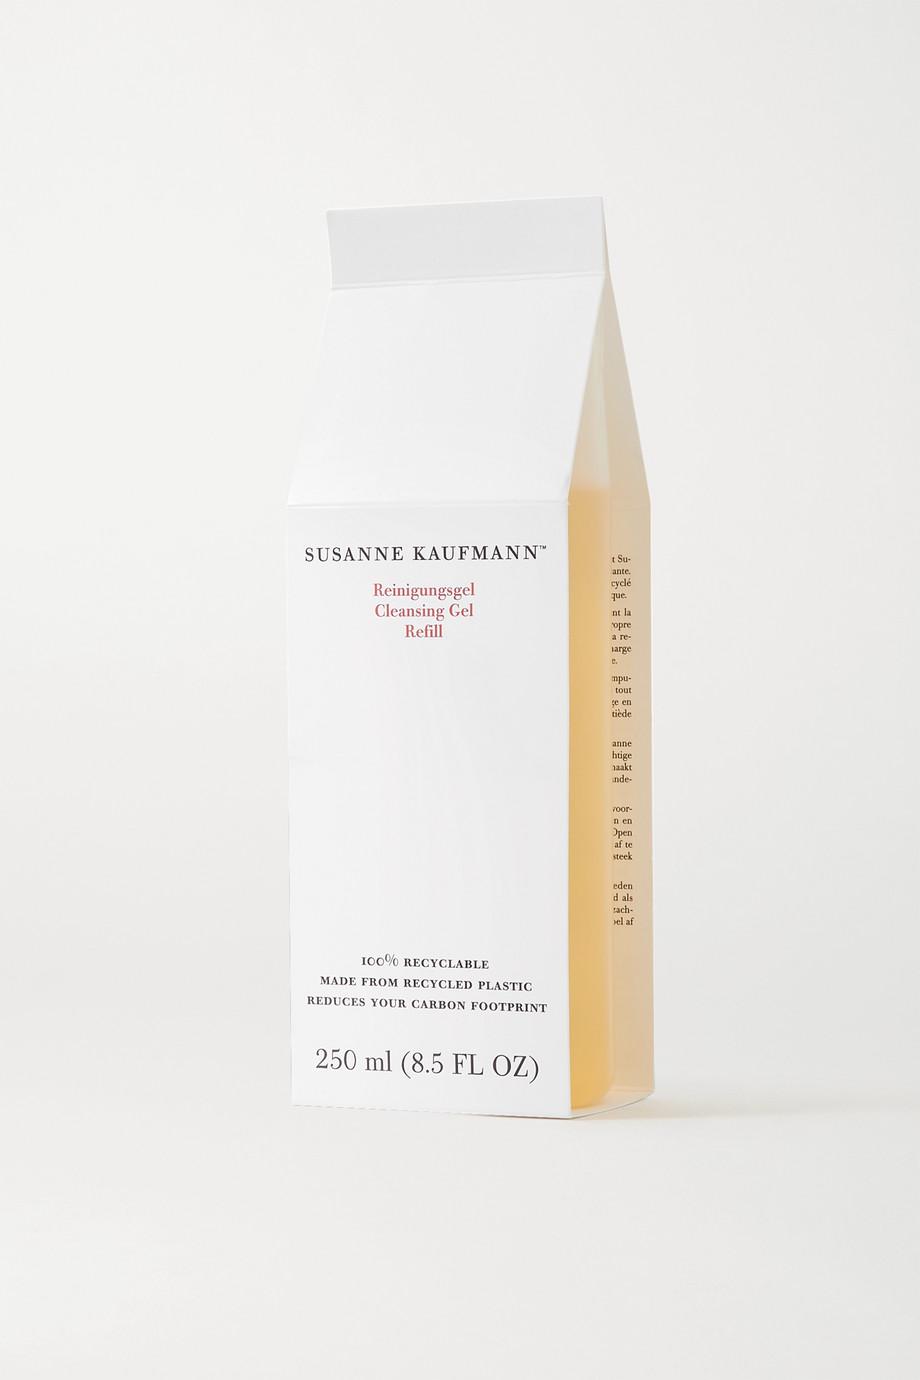 Susanne Kaufmann Cleansing Gel Refill, 250ml